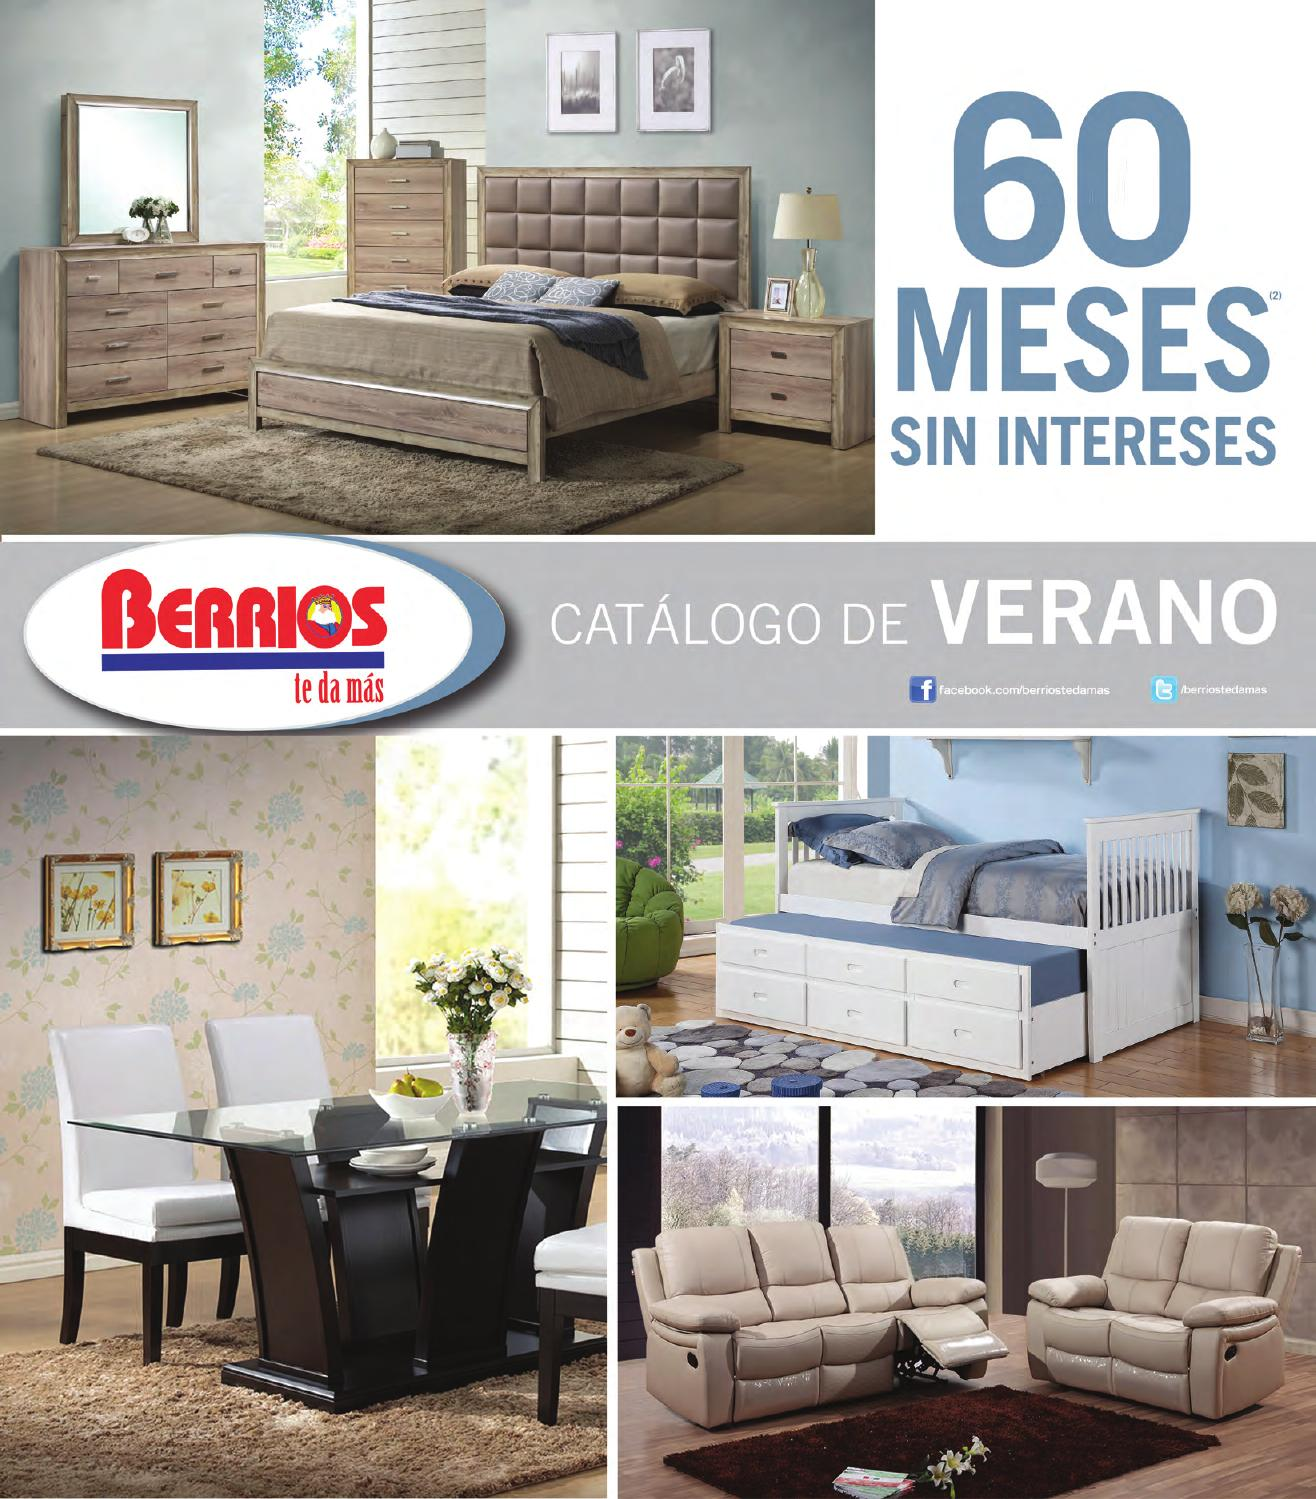 Mueblerias Berrios | Catálogo Verano 2015 By Berrios   Issuu